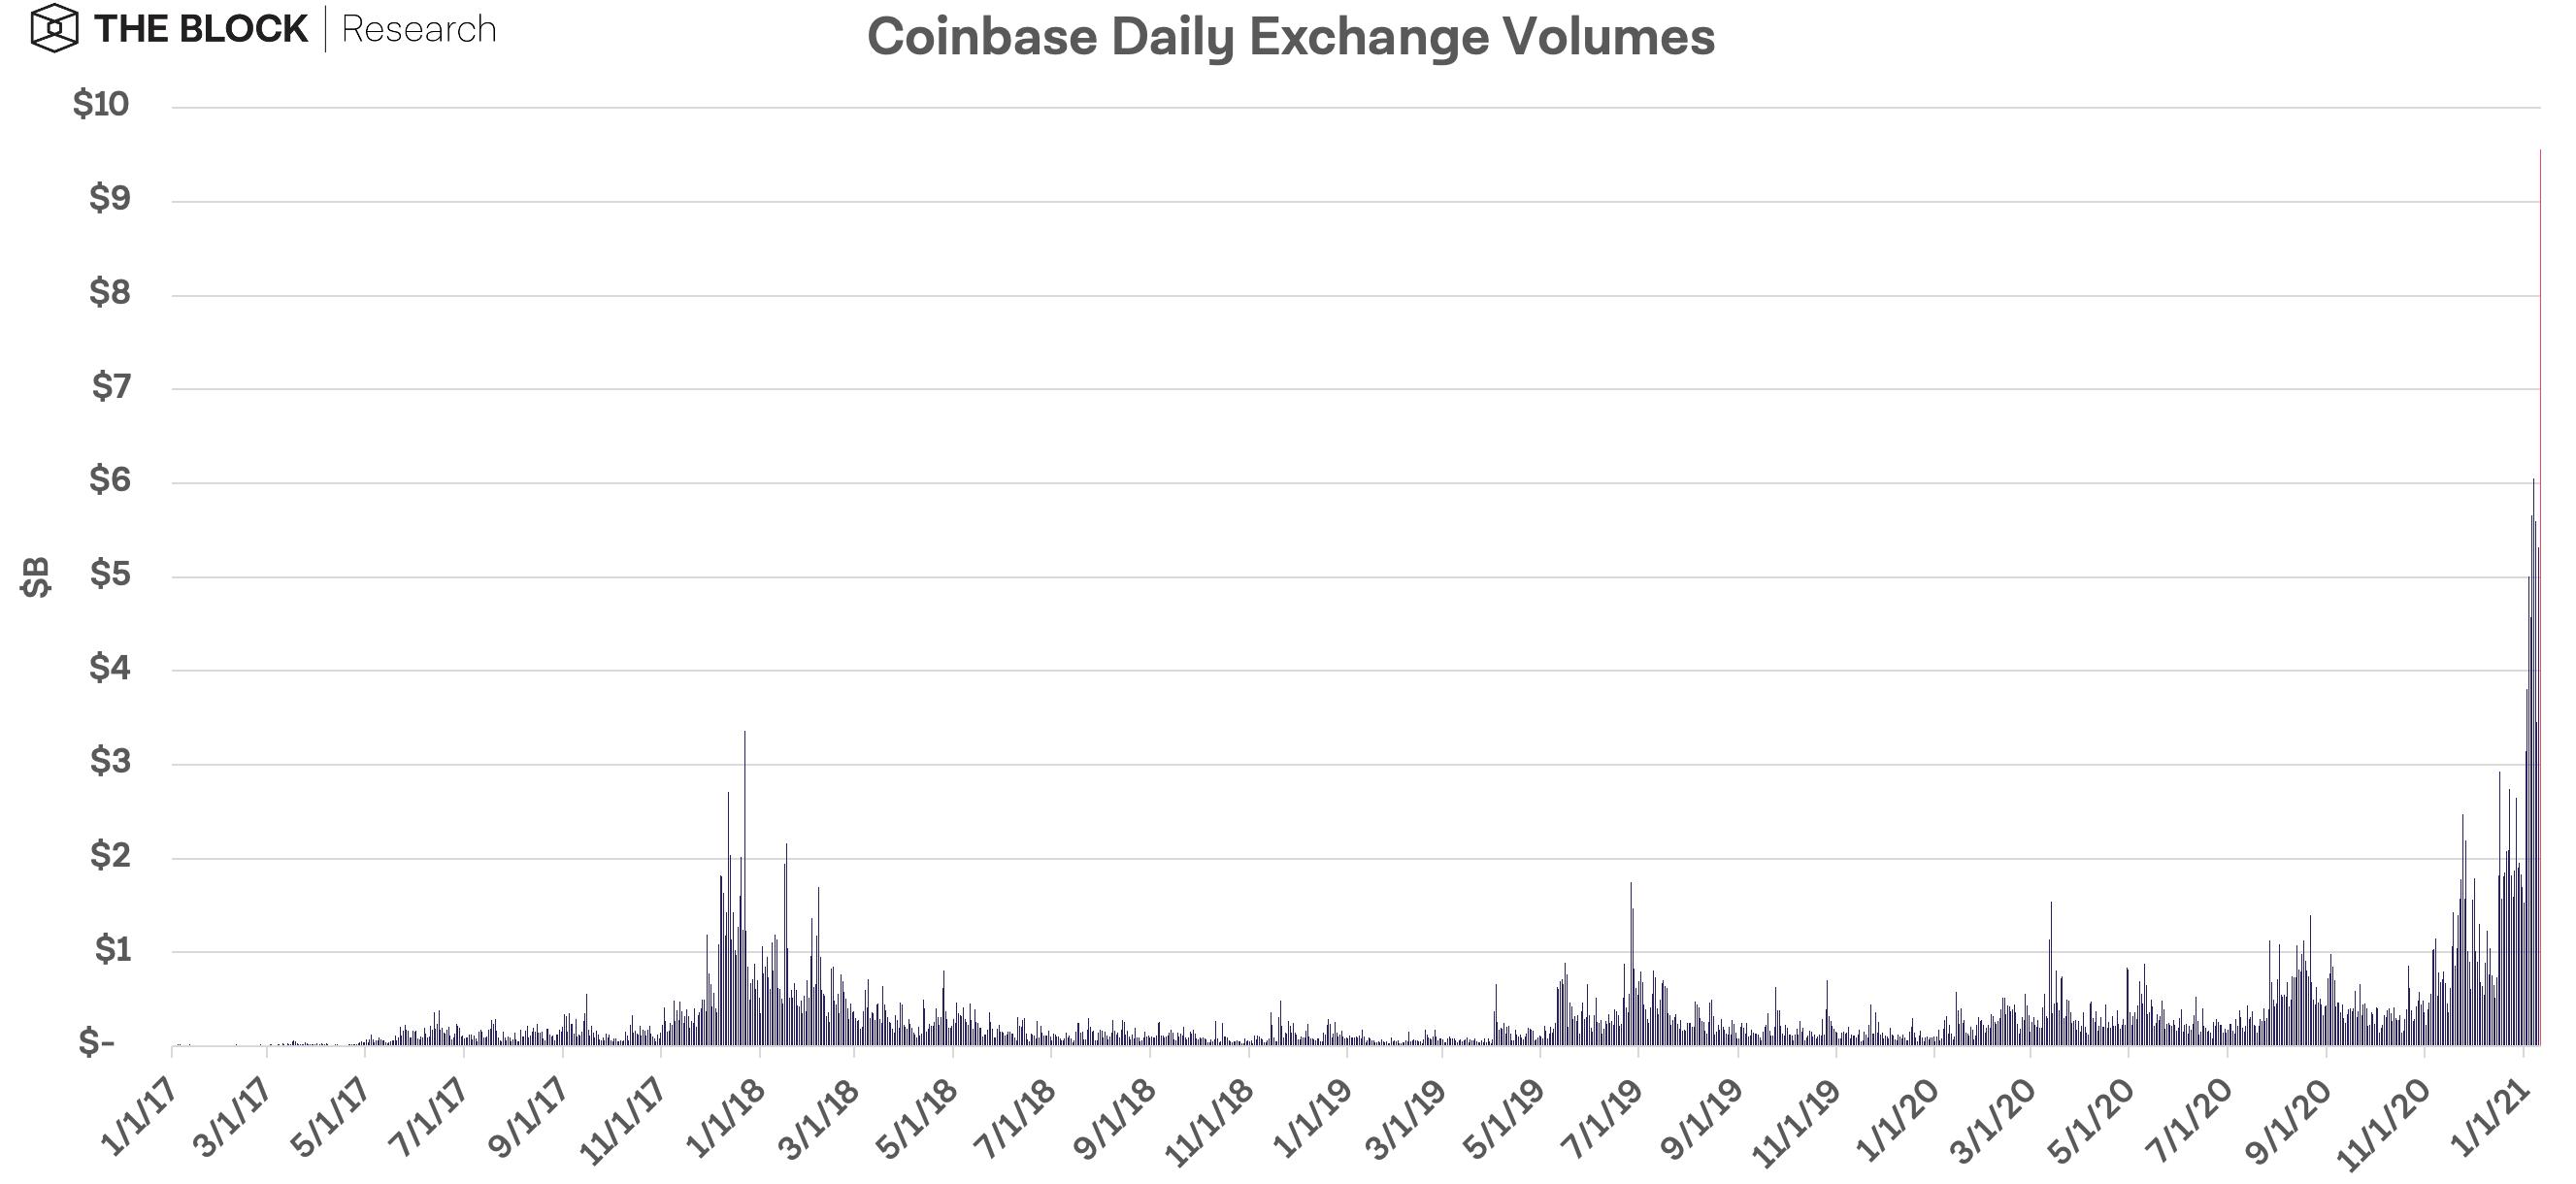 Coinbase - شکست رکورد حجم معاملات روزانه صرافیهای رمزنگاری Coinbase و Binance